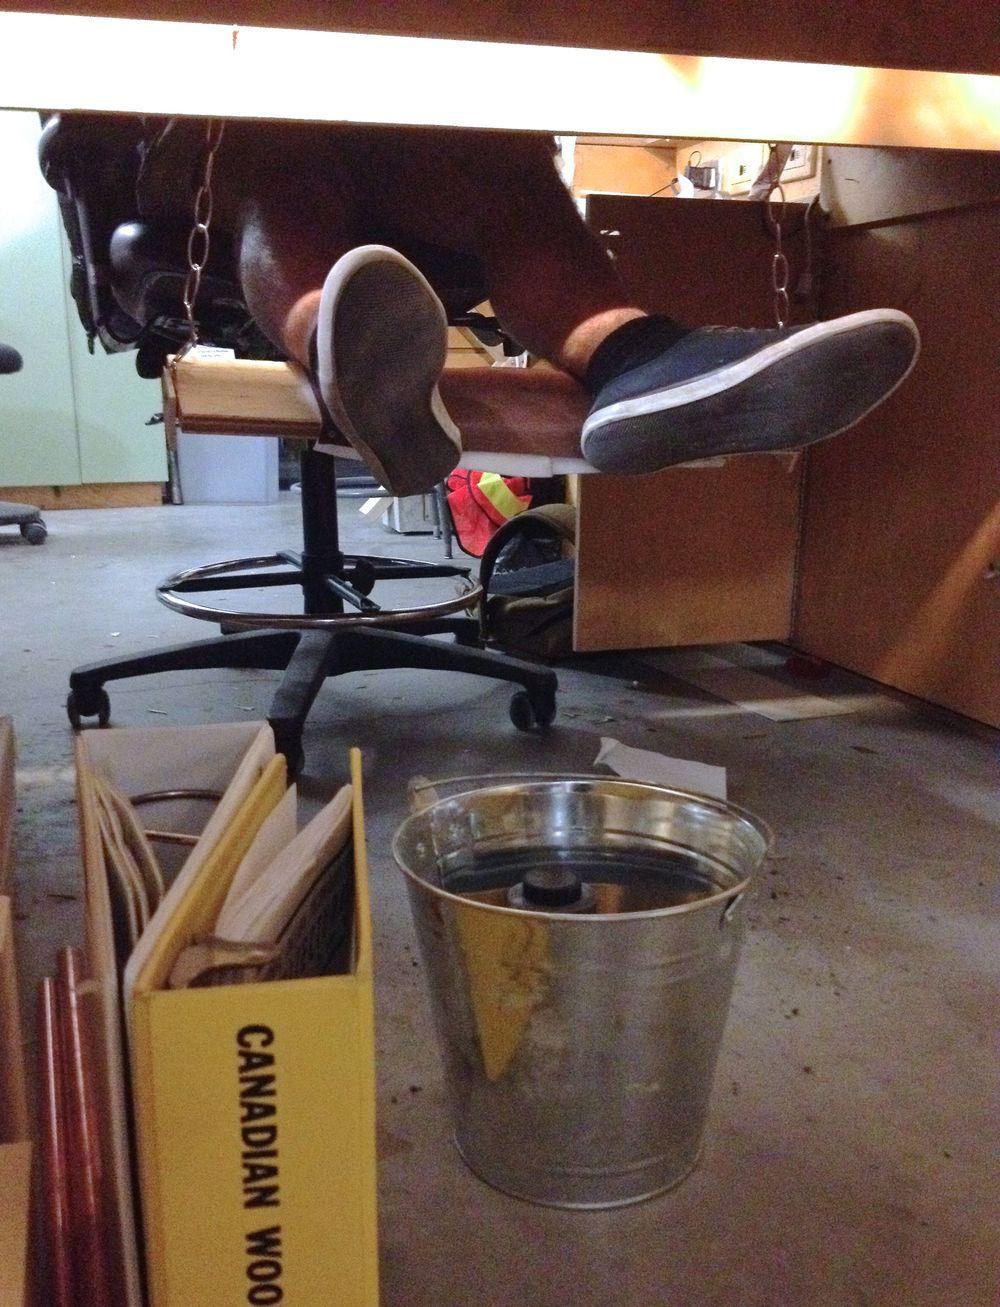 Foot rest/ swing design.